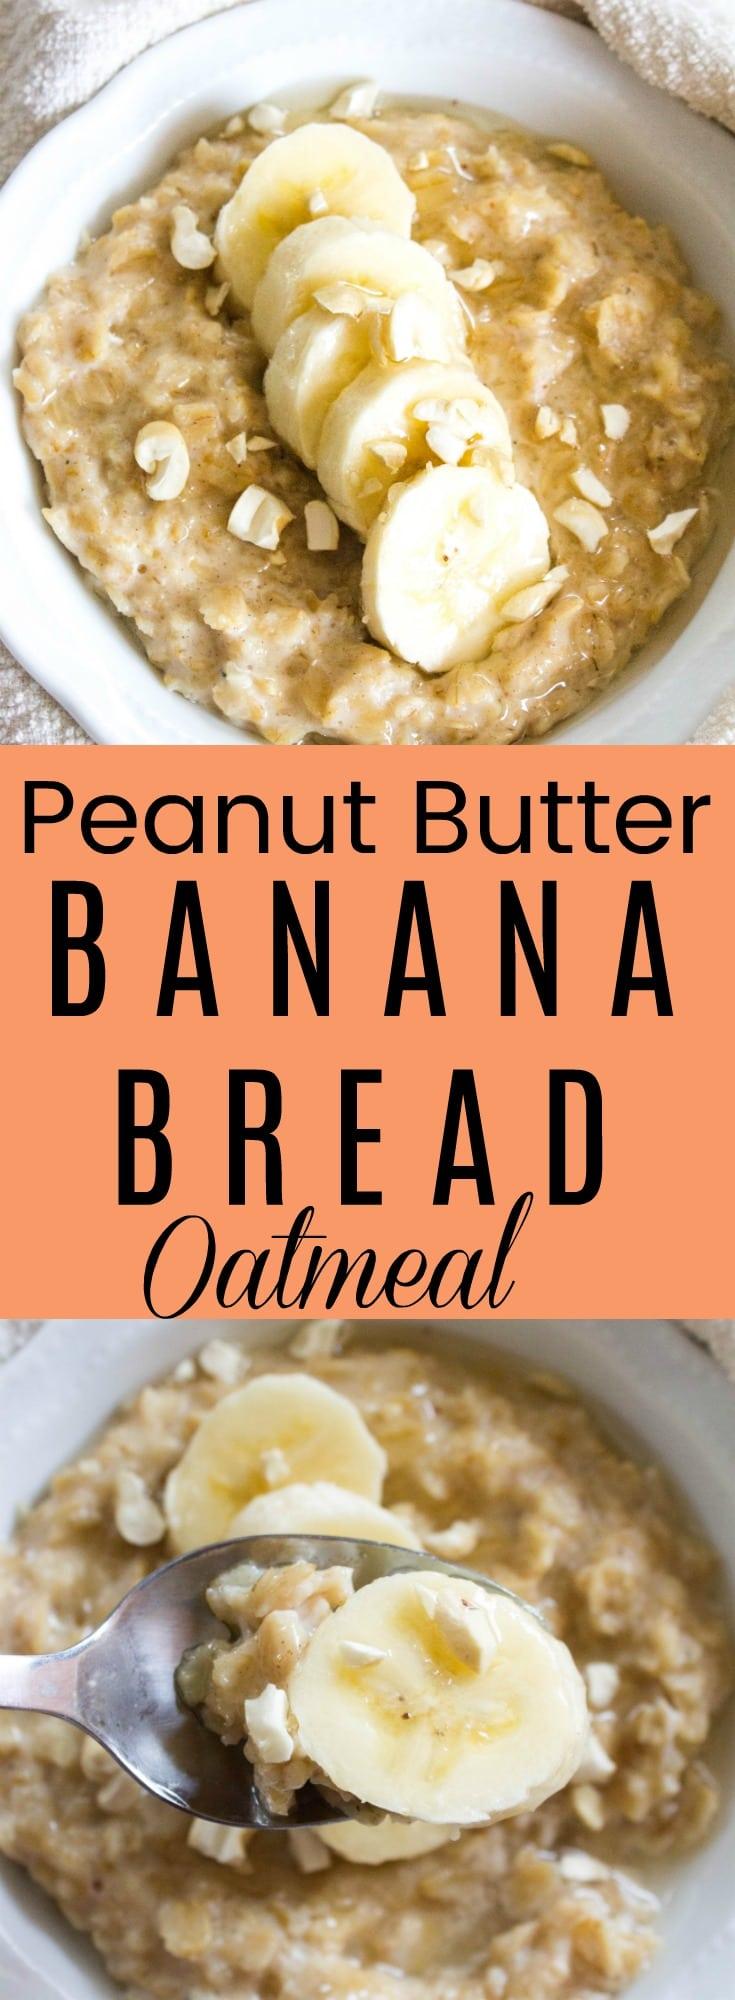 Peanut Butter Banana Bread Oatmeal 3